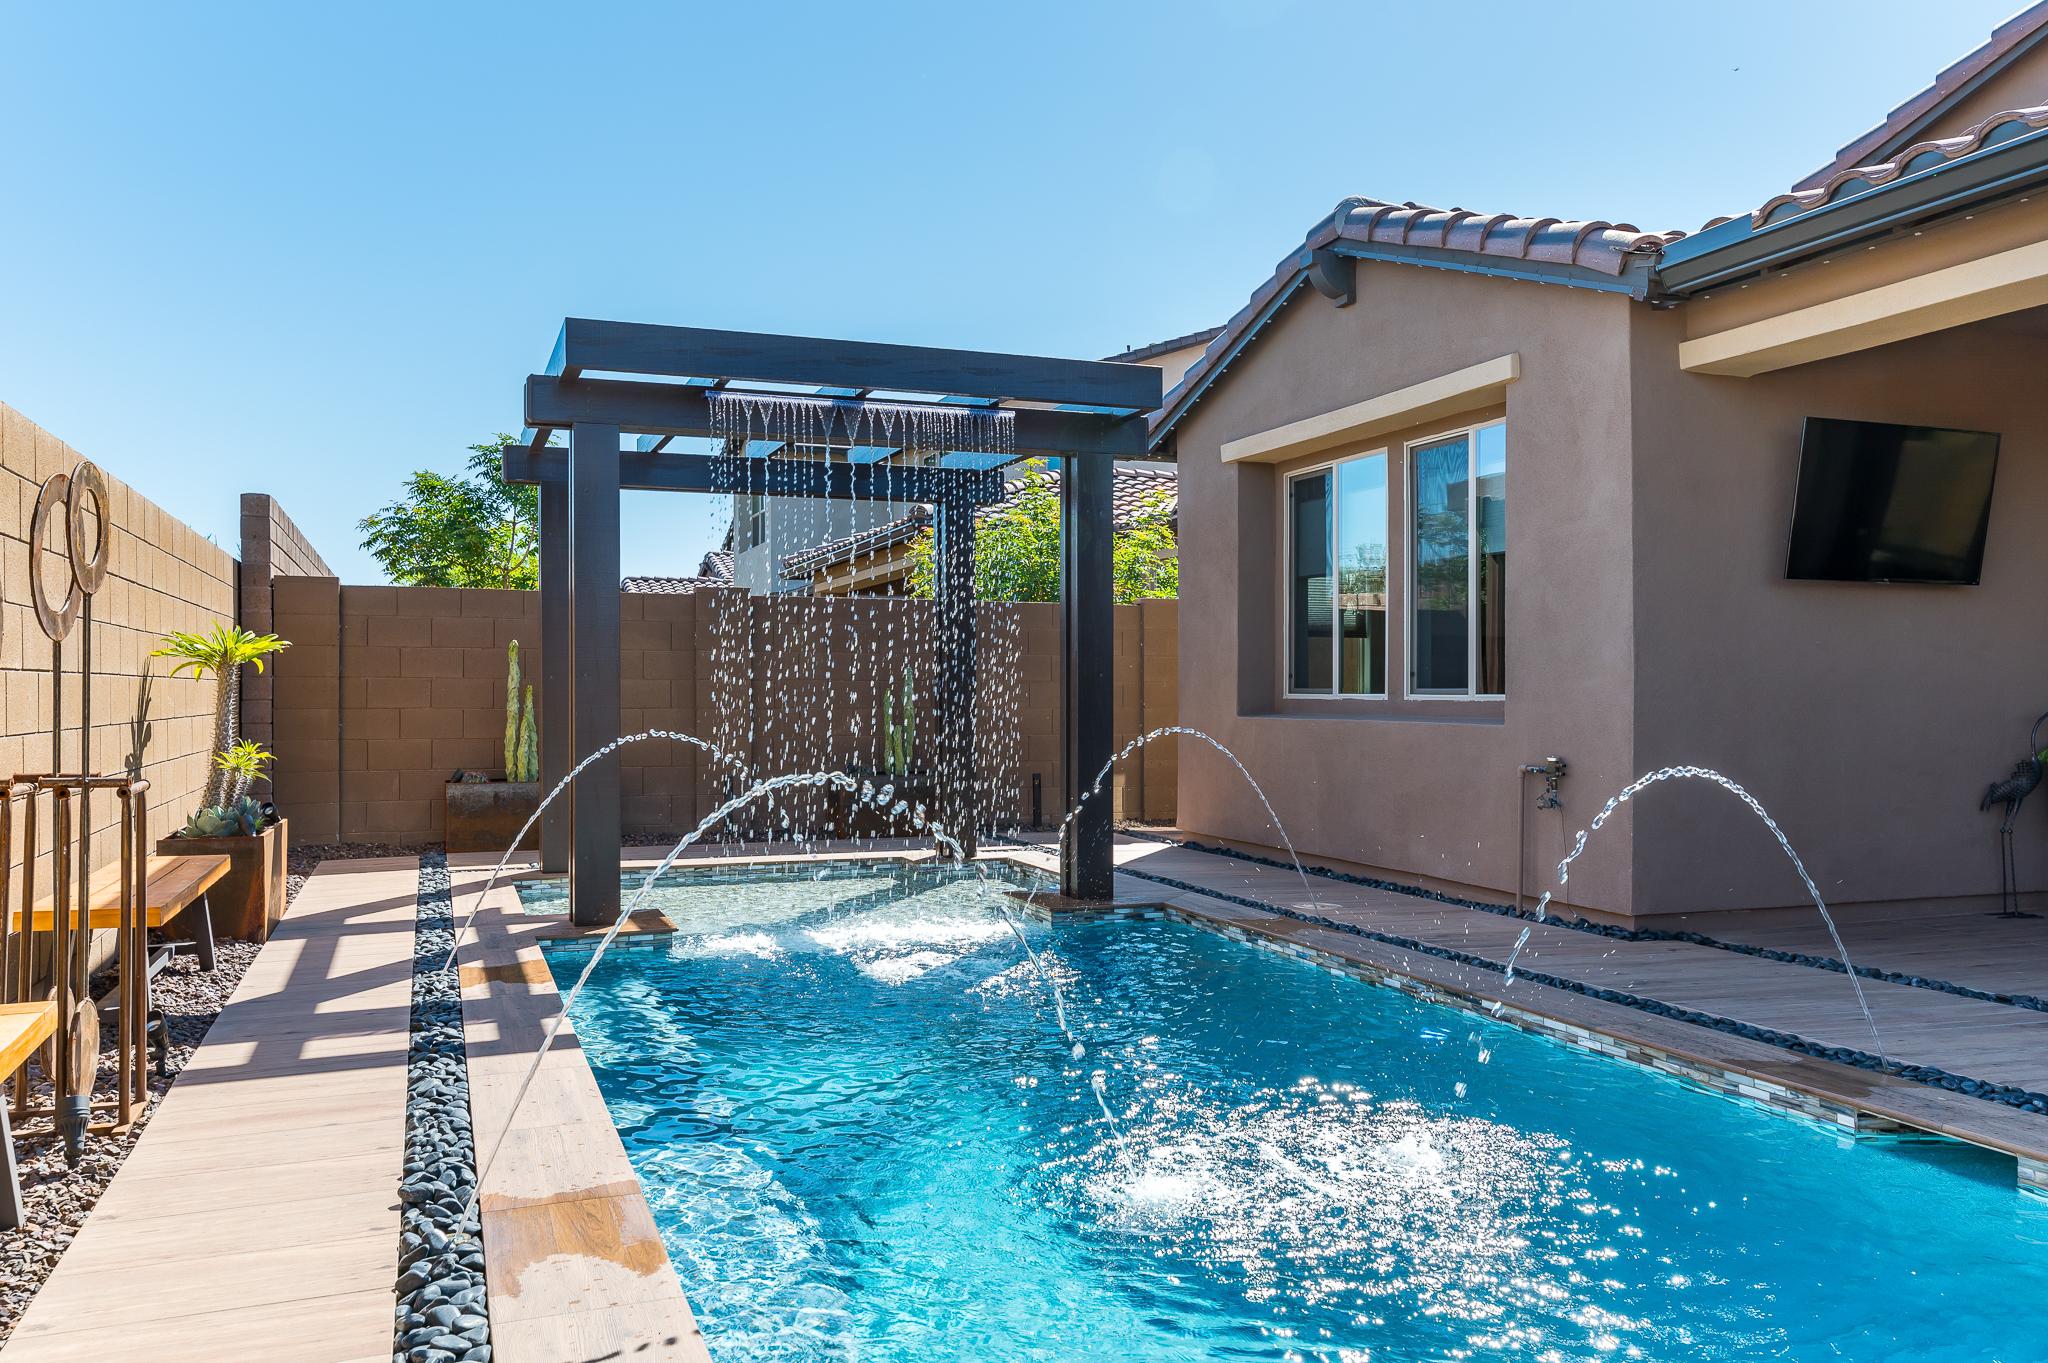 Geometric Swimming Pool Designs Presidential Pools Spas